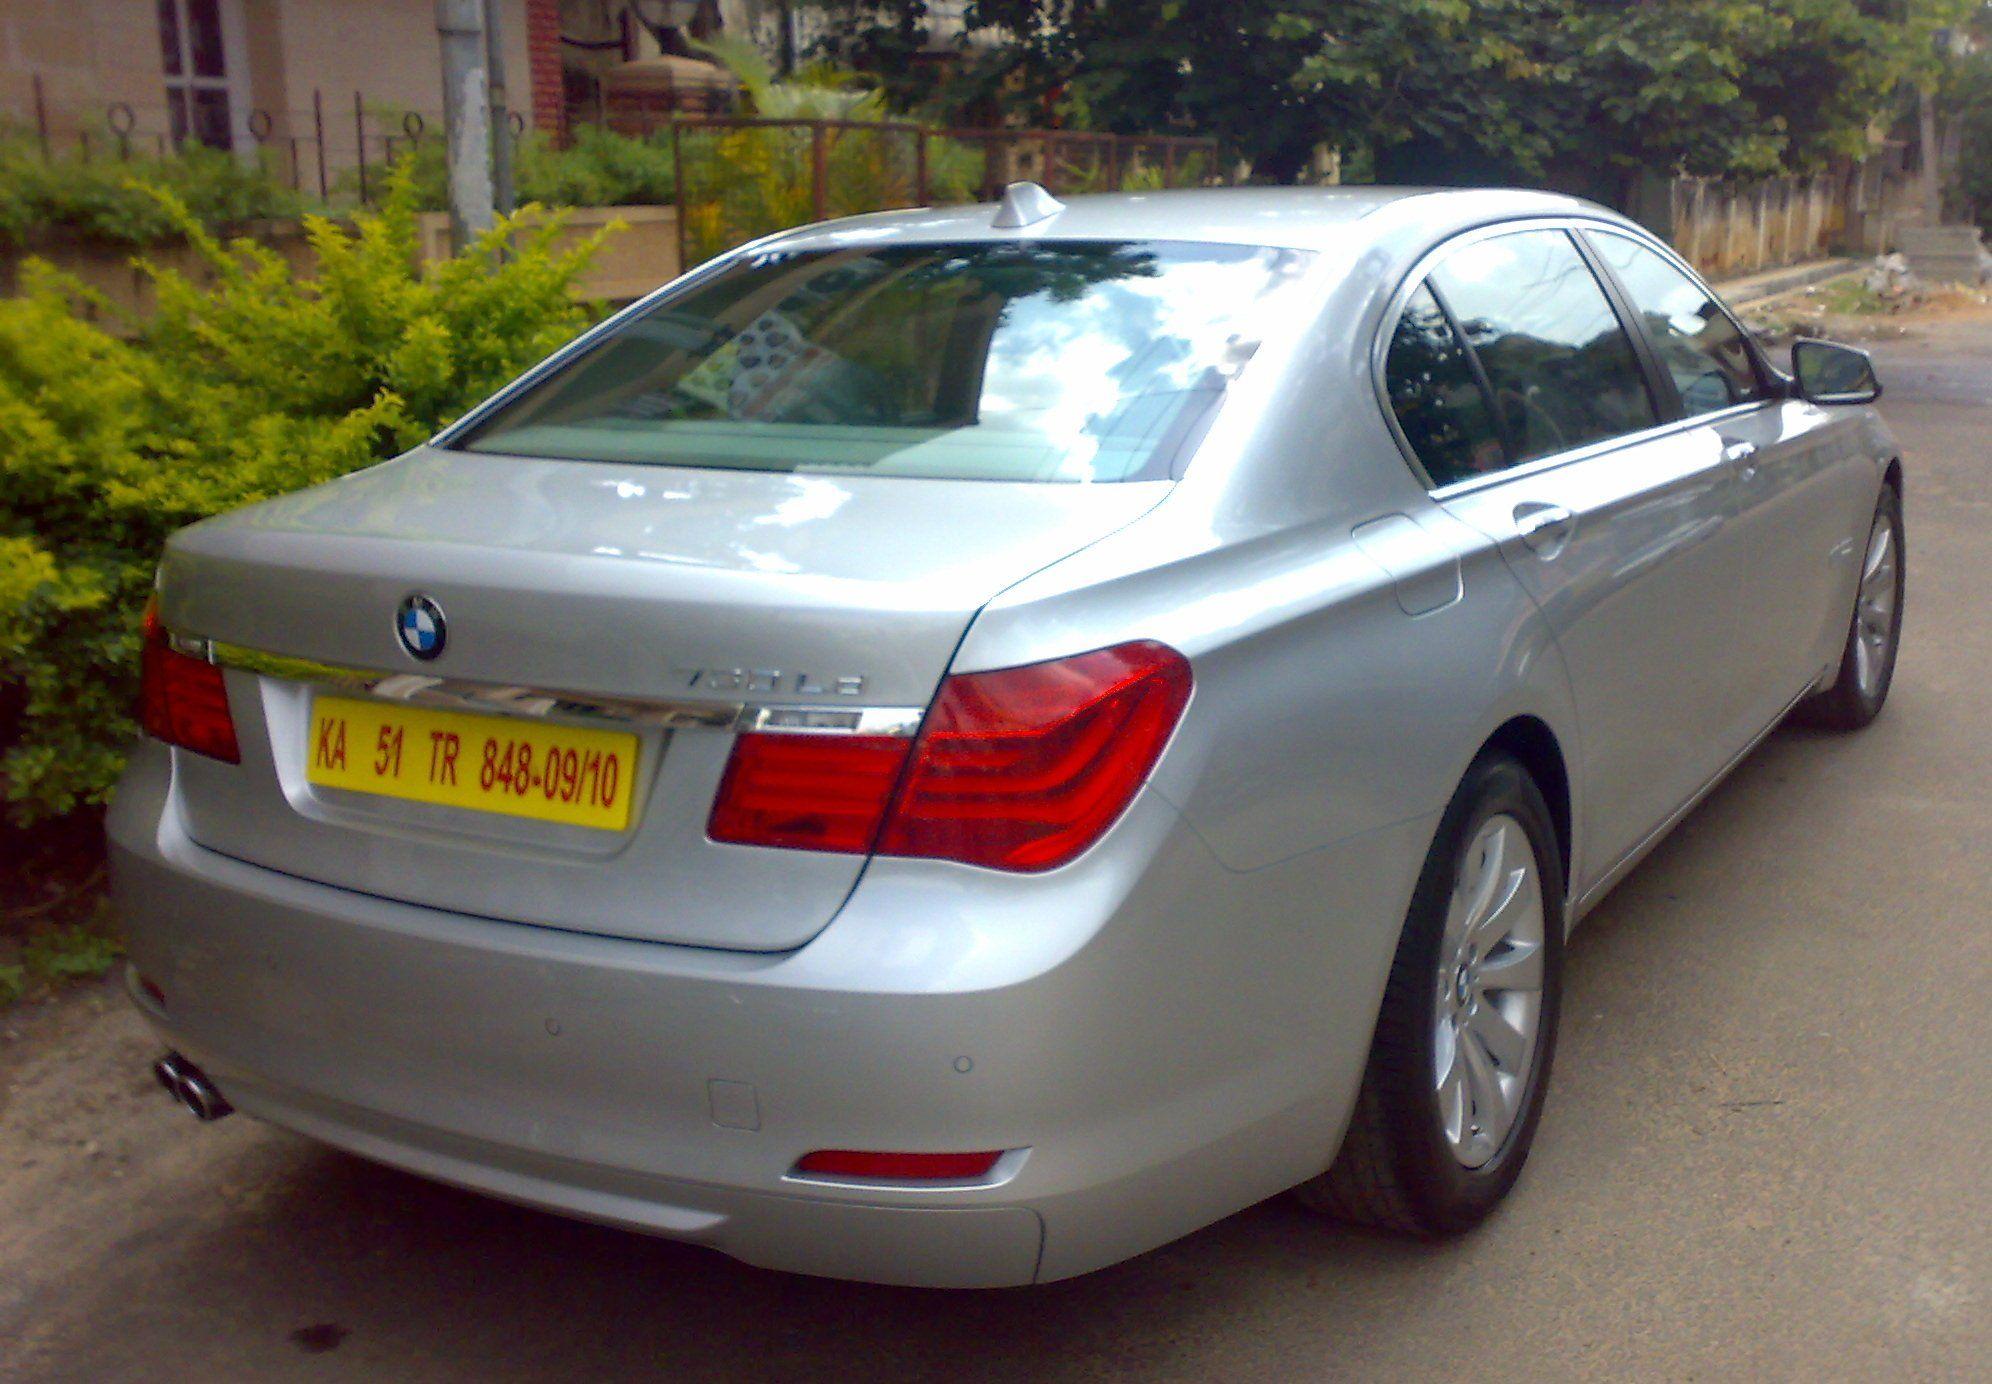 Wedding audi car car hire bangalore wedding audi car rental in bangalore http bangalorecabhire com benzeclass html s g rent a cars 24 7 booking